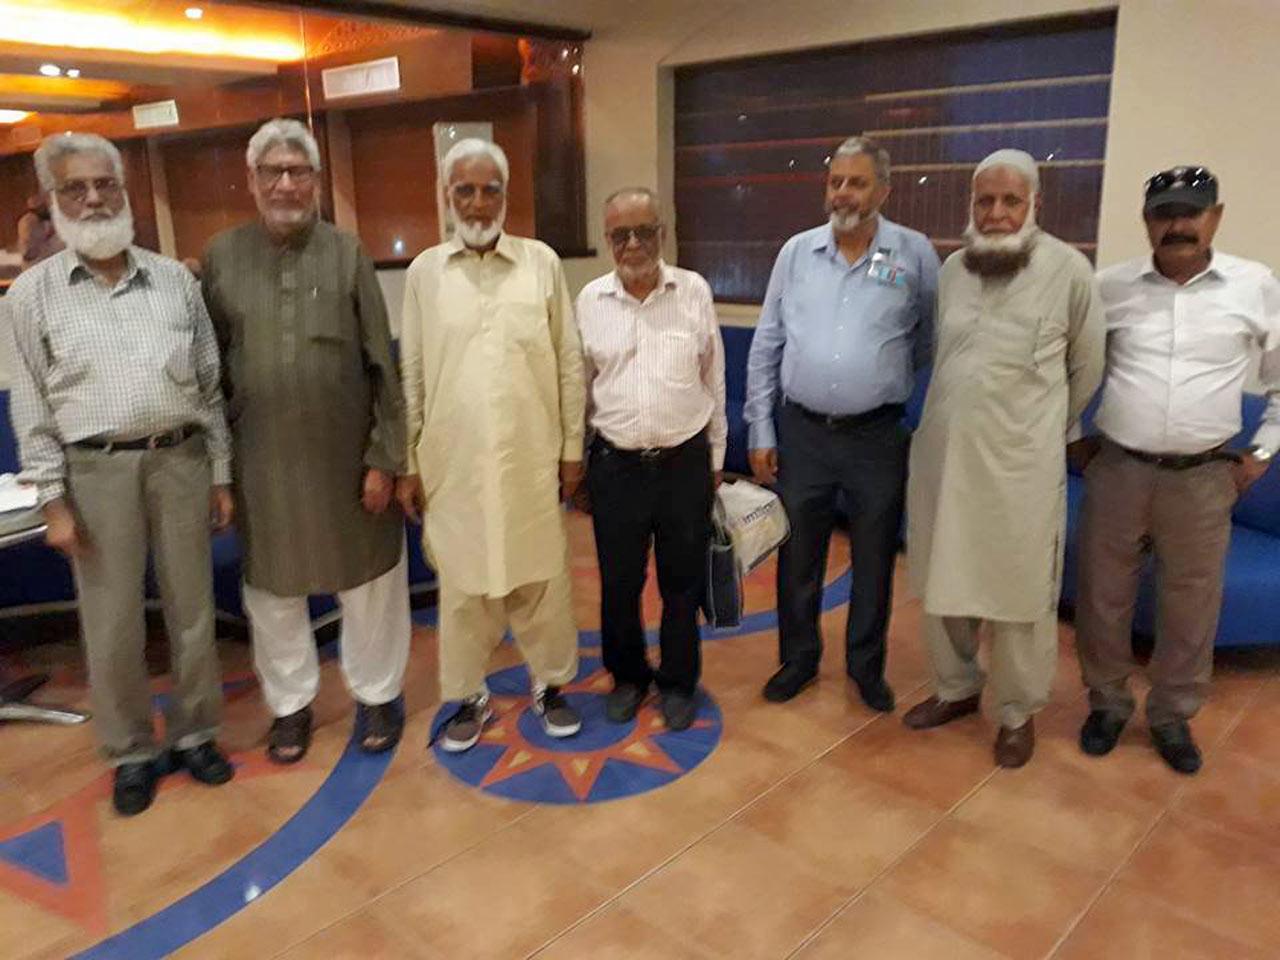 Jamiluddin Shaikh, Muhammad Salim Hamid, Kamal A. Farooqi, Mohammad Abdul Matin, Arif Qamar, Aziz Ur Rehman Khan, Sabir Ali